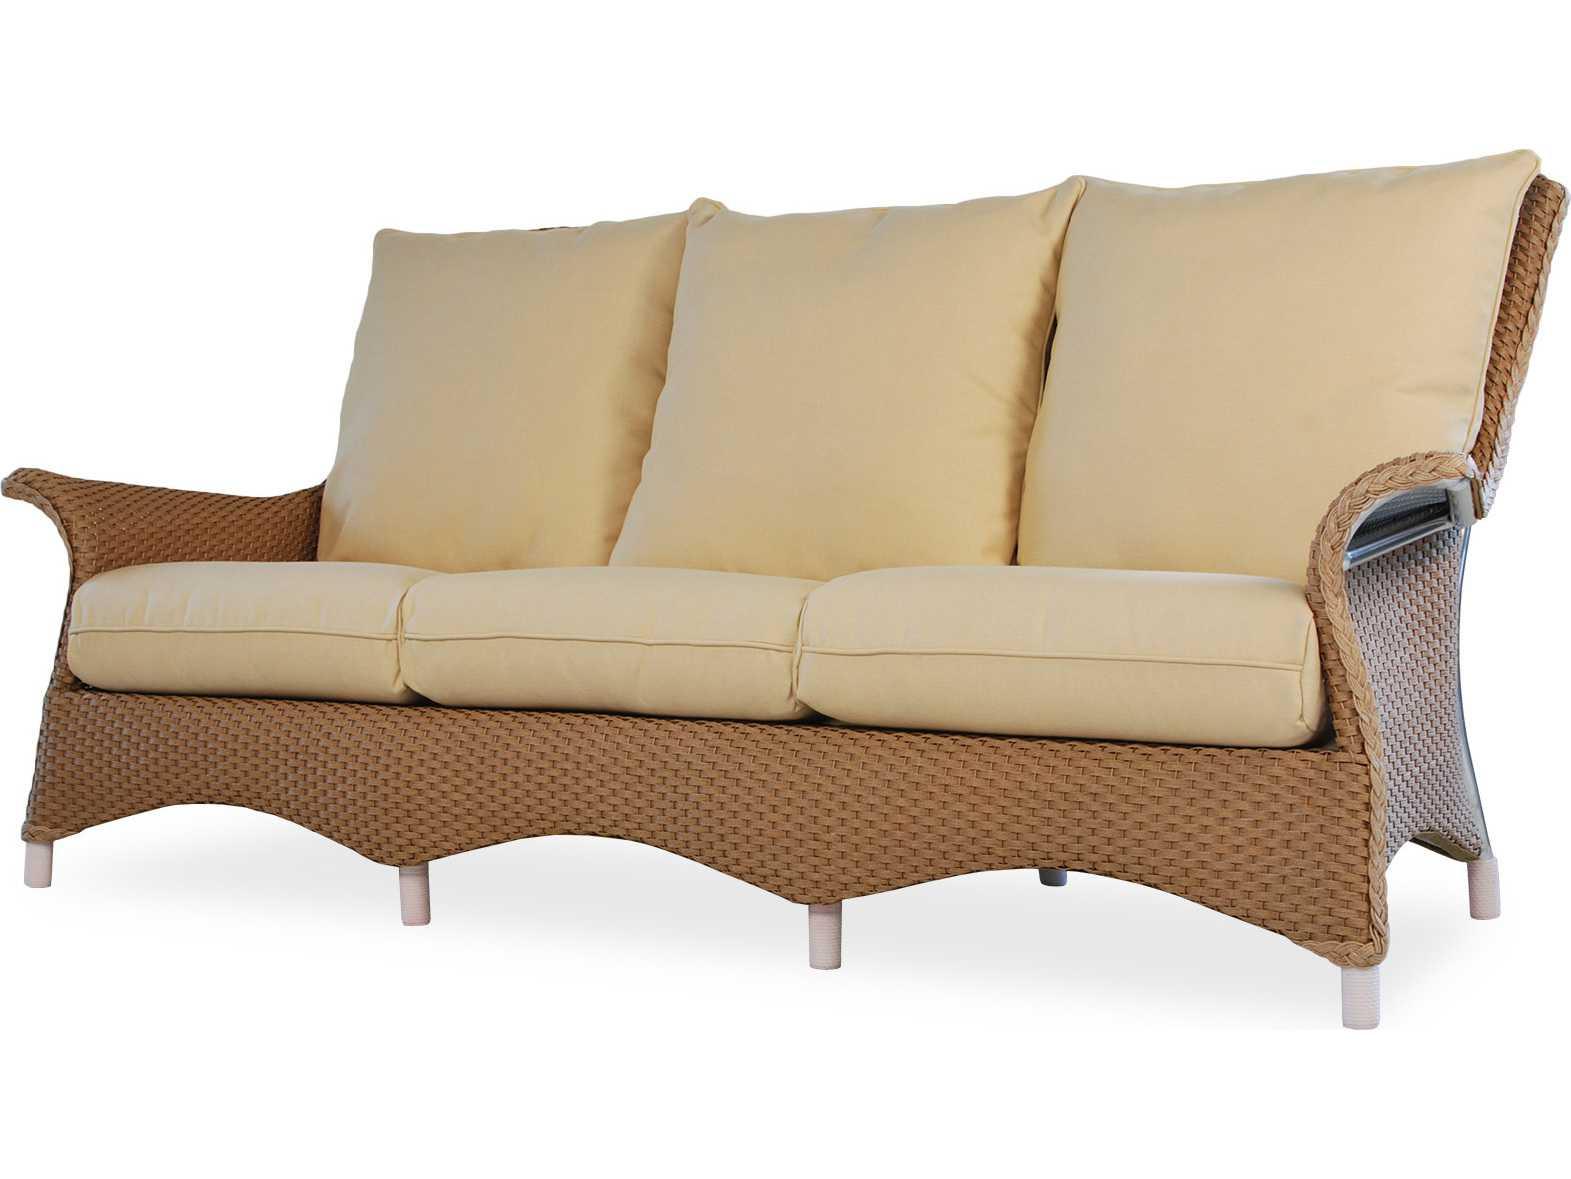 replacement cushions for sofa backs stanton sofas dealer login lloyd flanders mandalay 27055ch